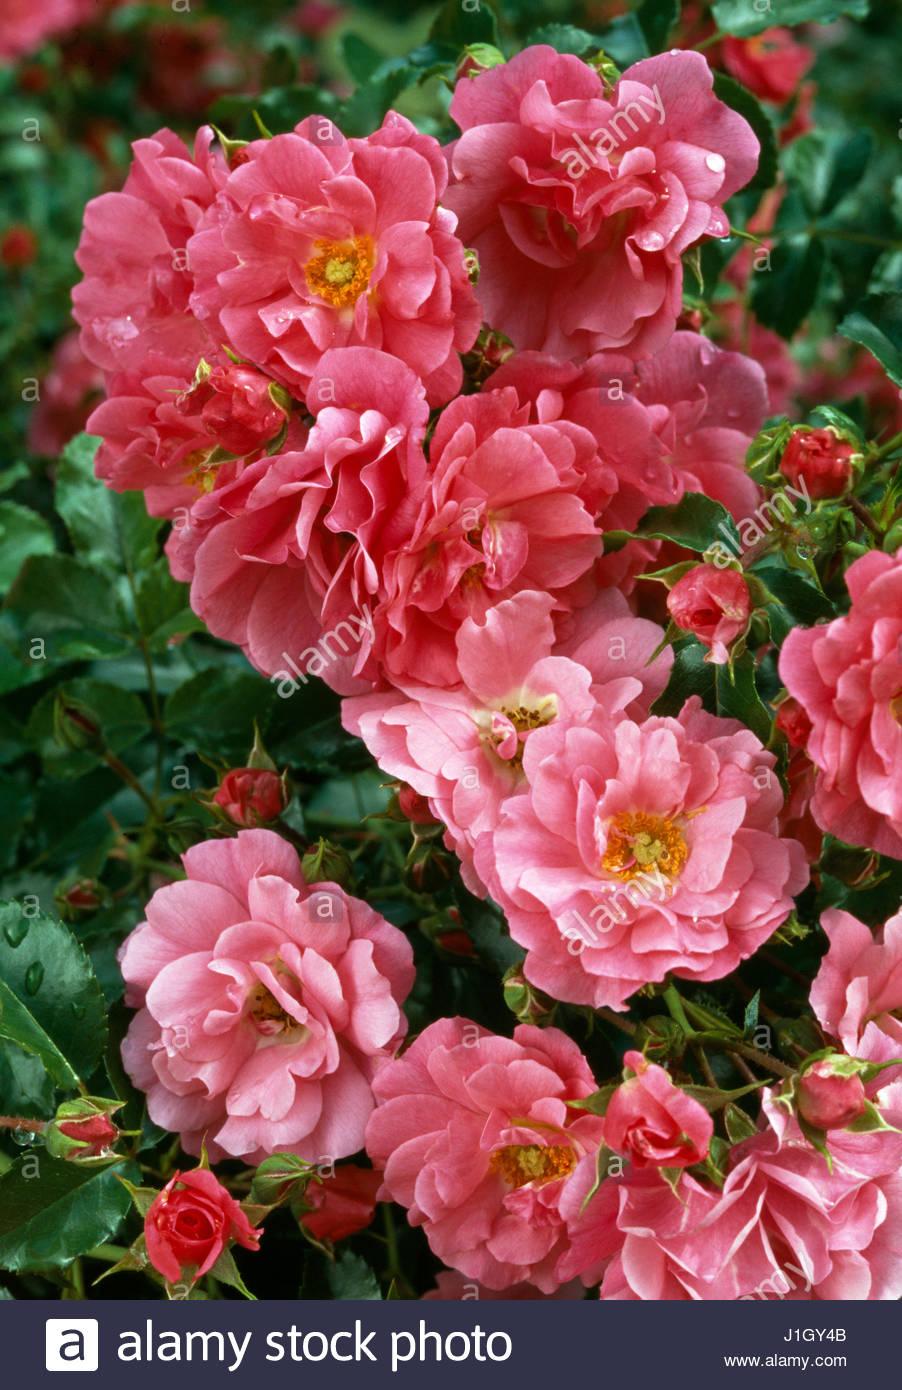 Rosa flower carpet pink stock photo 138670123 alamy rosa flower carpet pink mightylinksfo